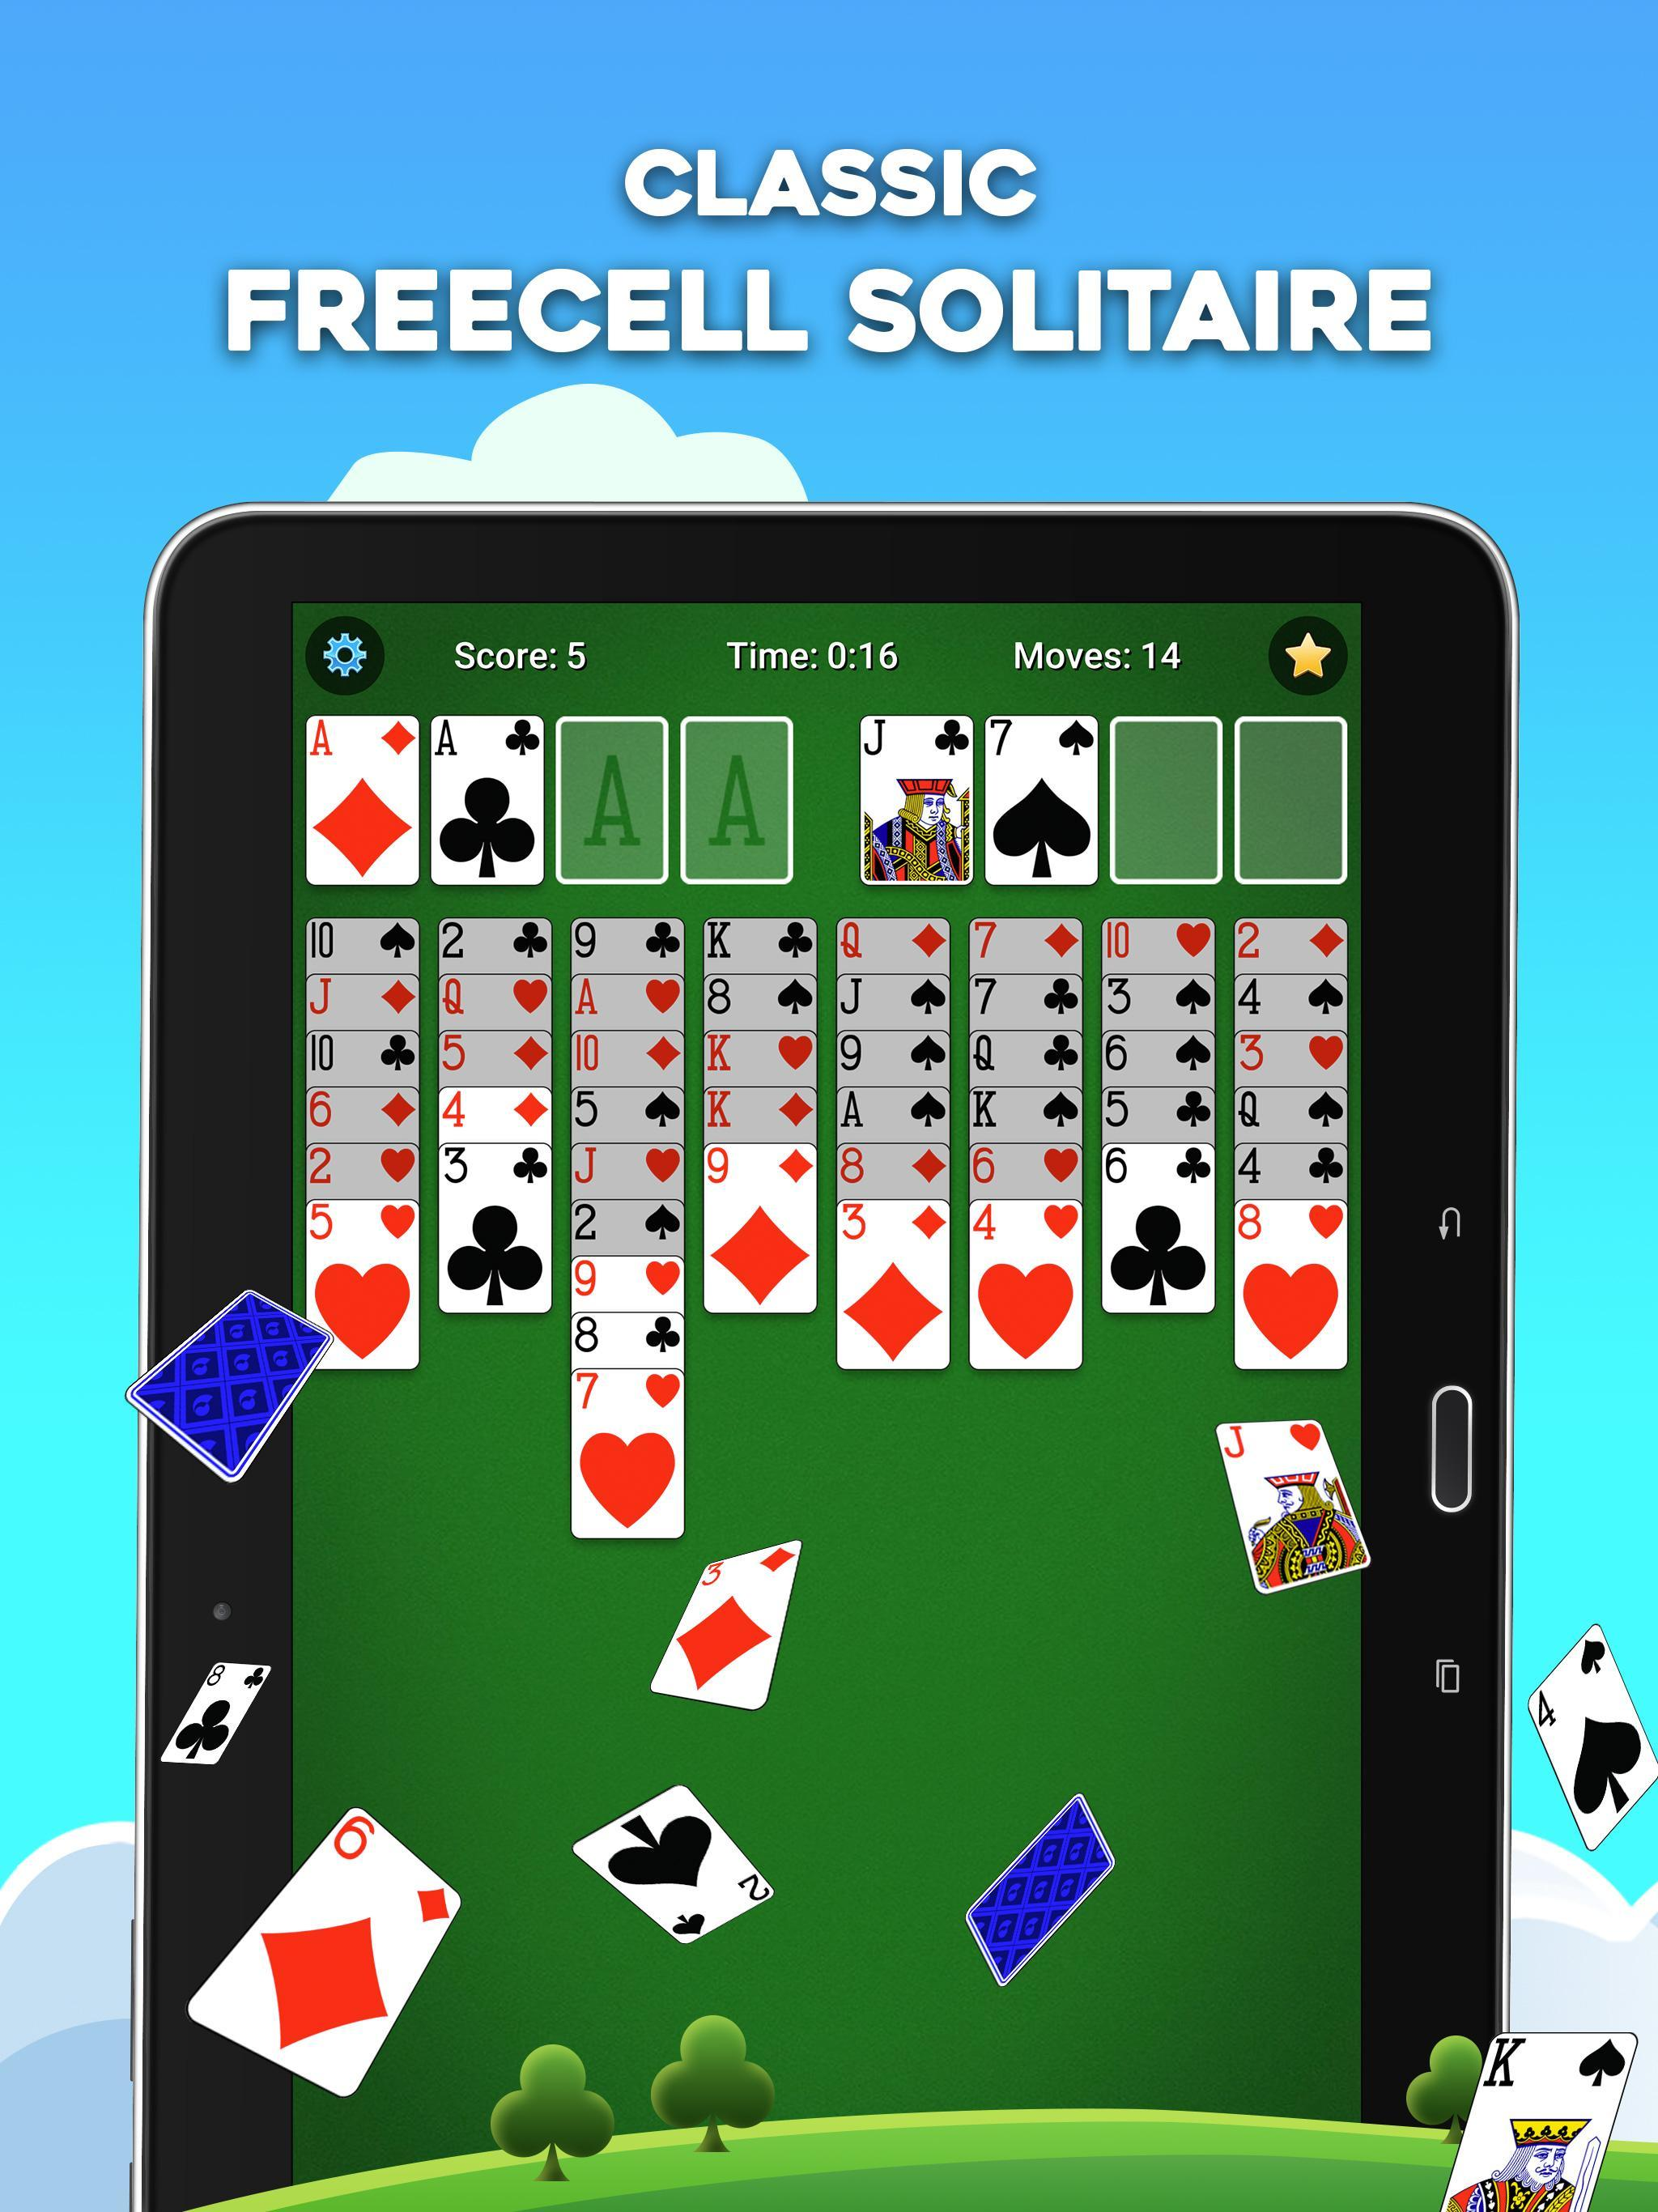 FreeCell Solitaire 5.4.0.3366 Screenshot 11